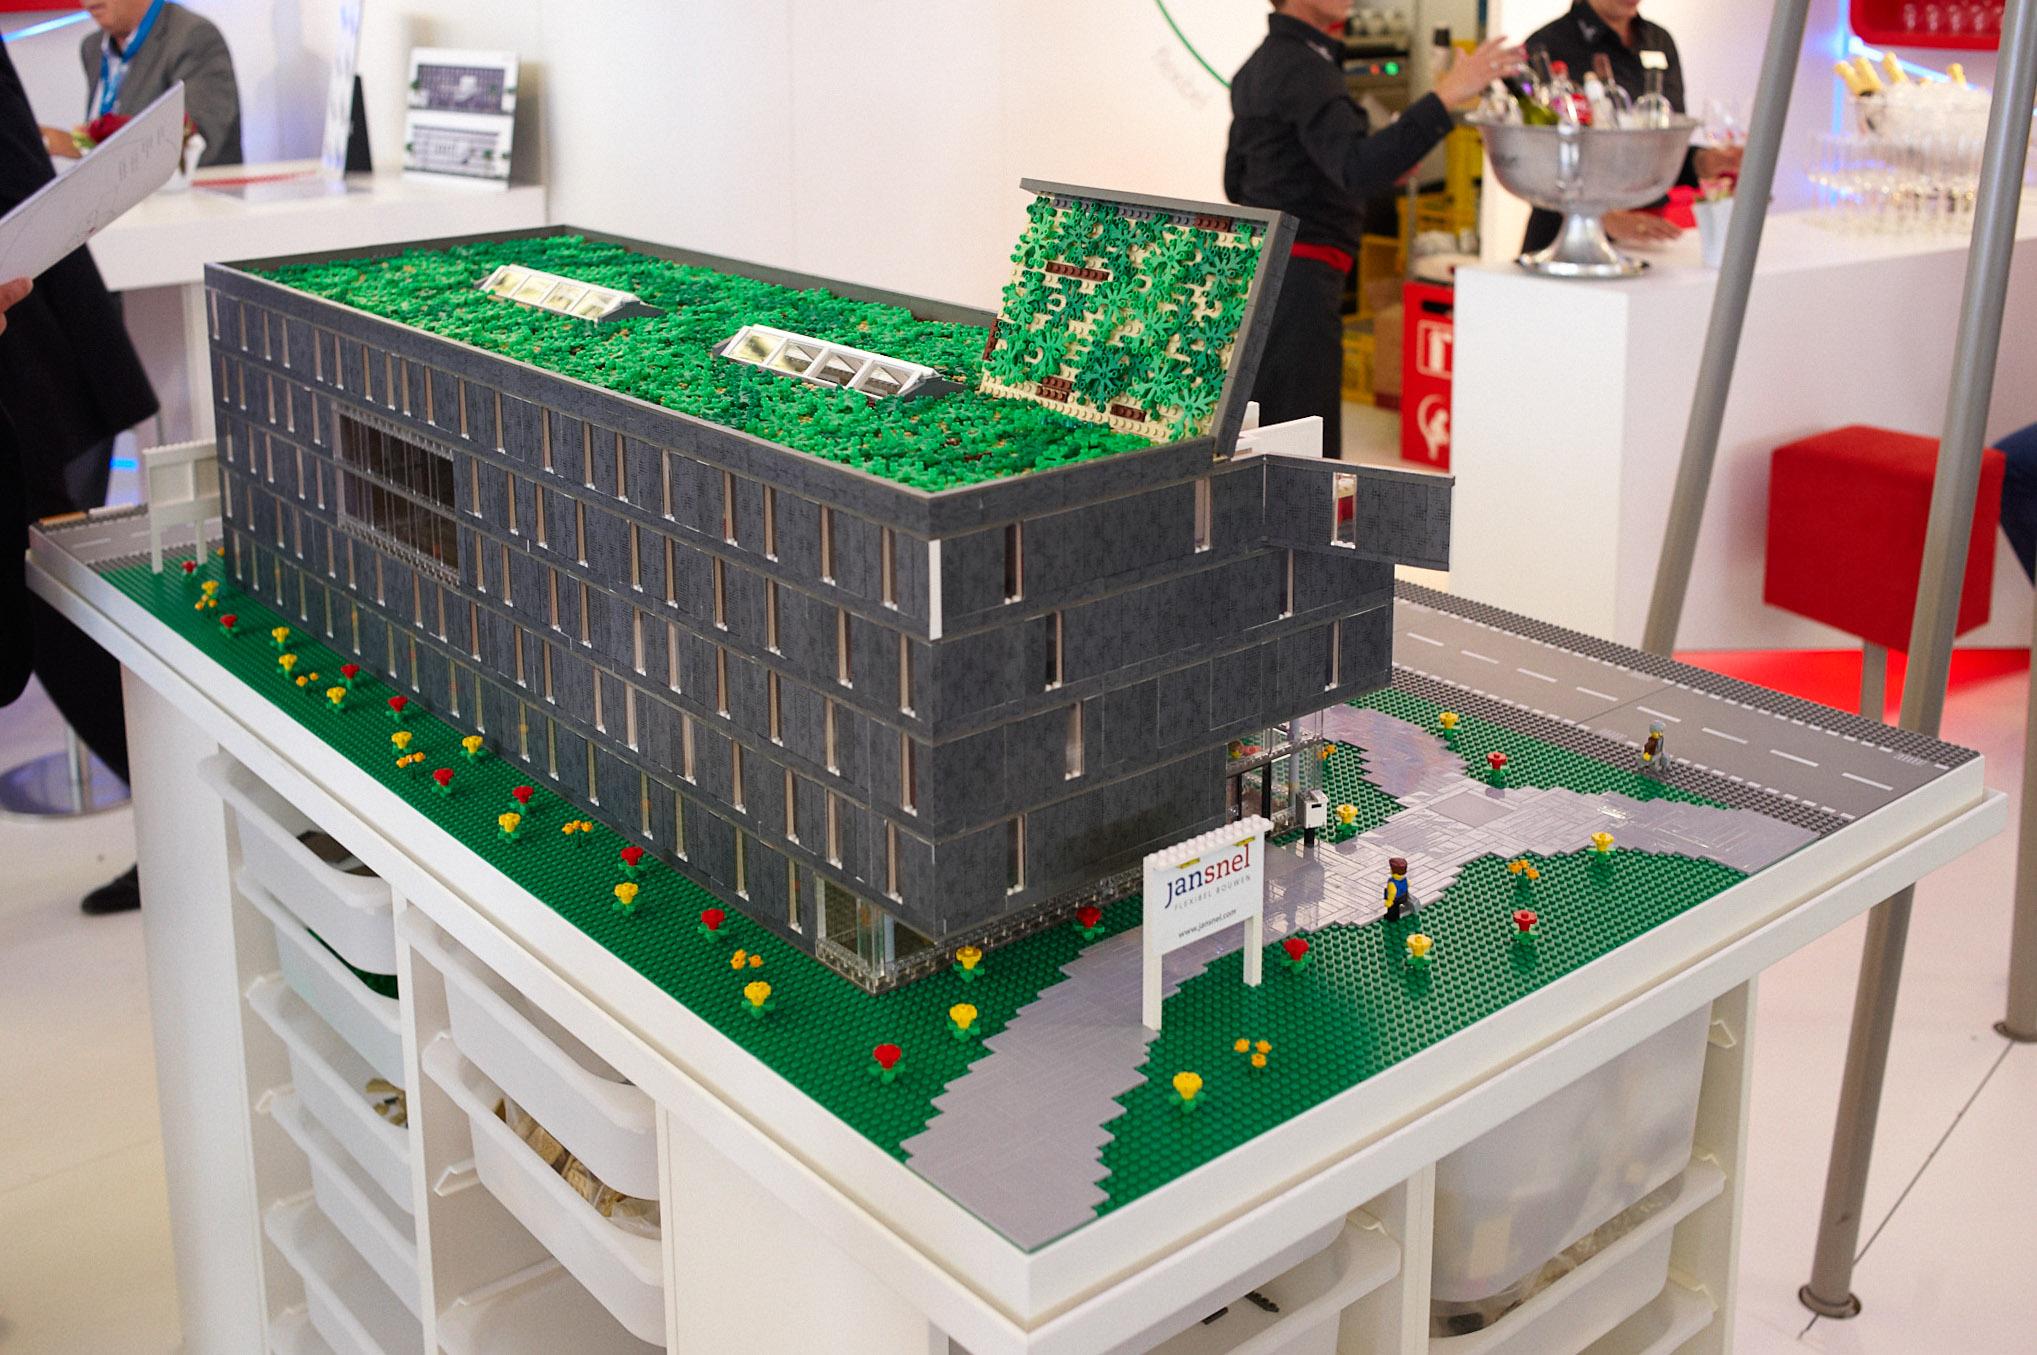 Lego Maquette Jan Snel 2